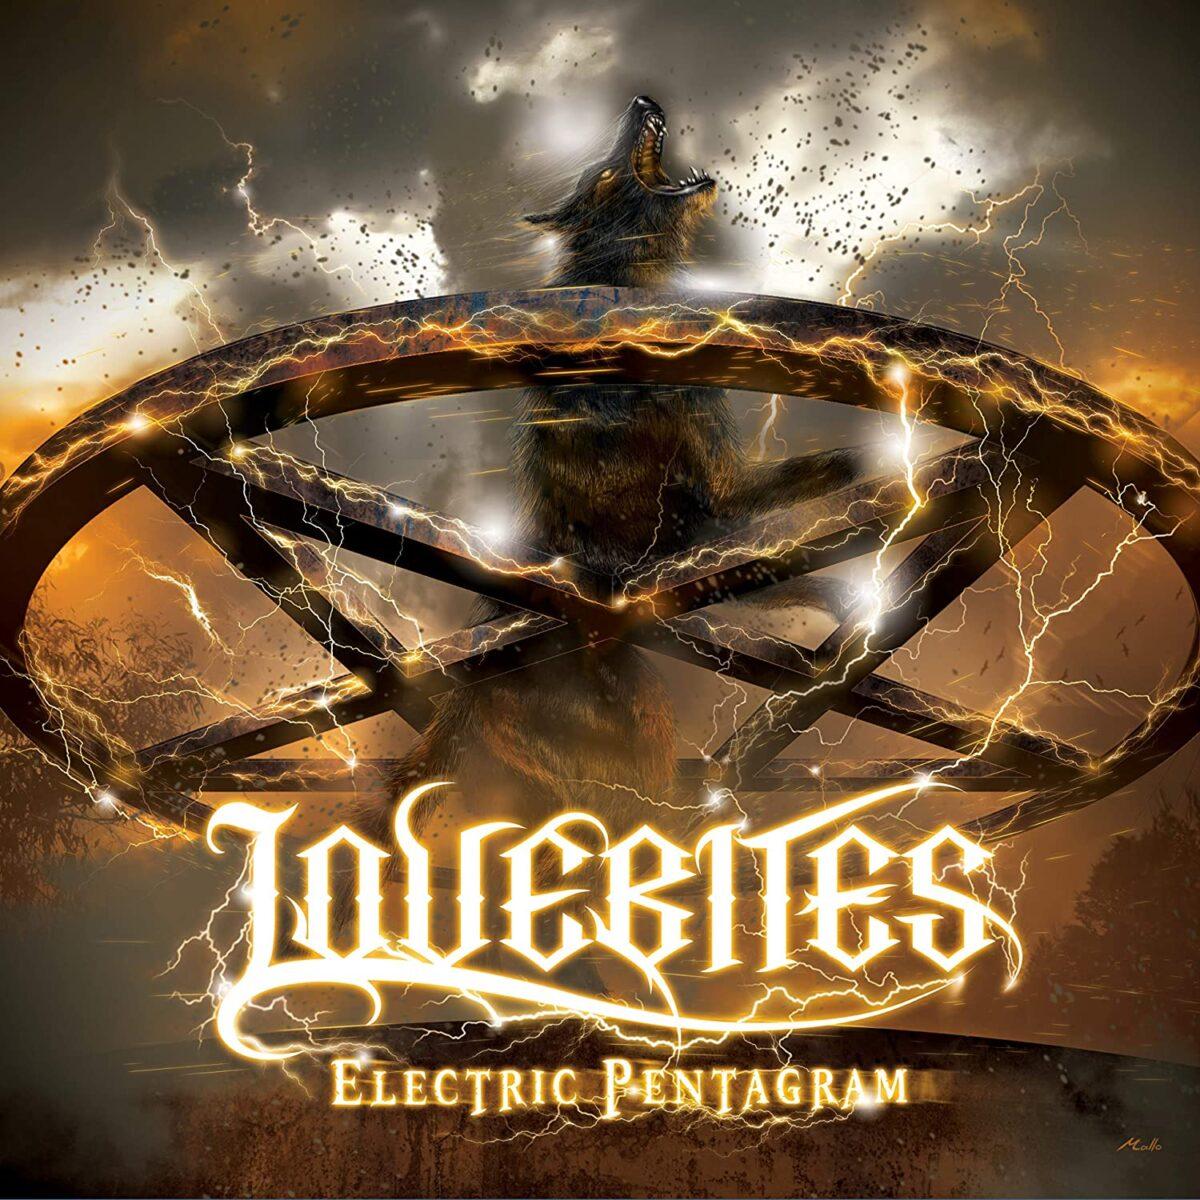 Lovebites Electric Pentagram CD Jacket